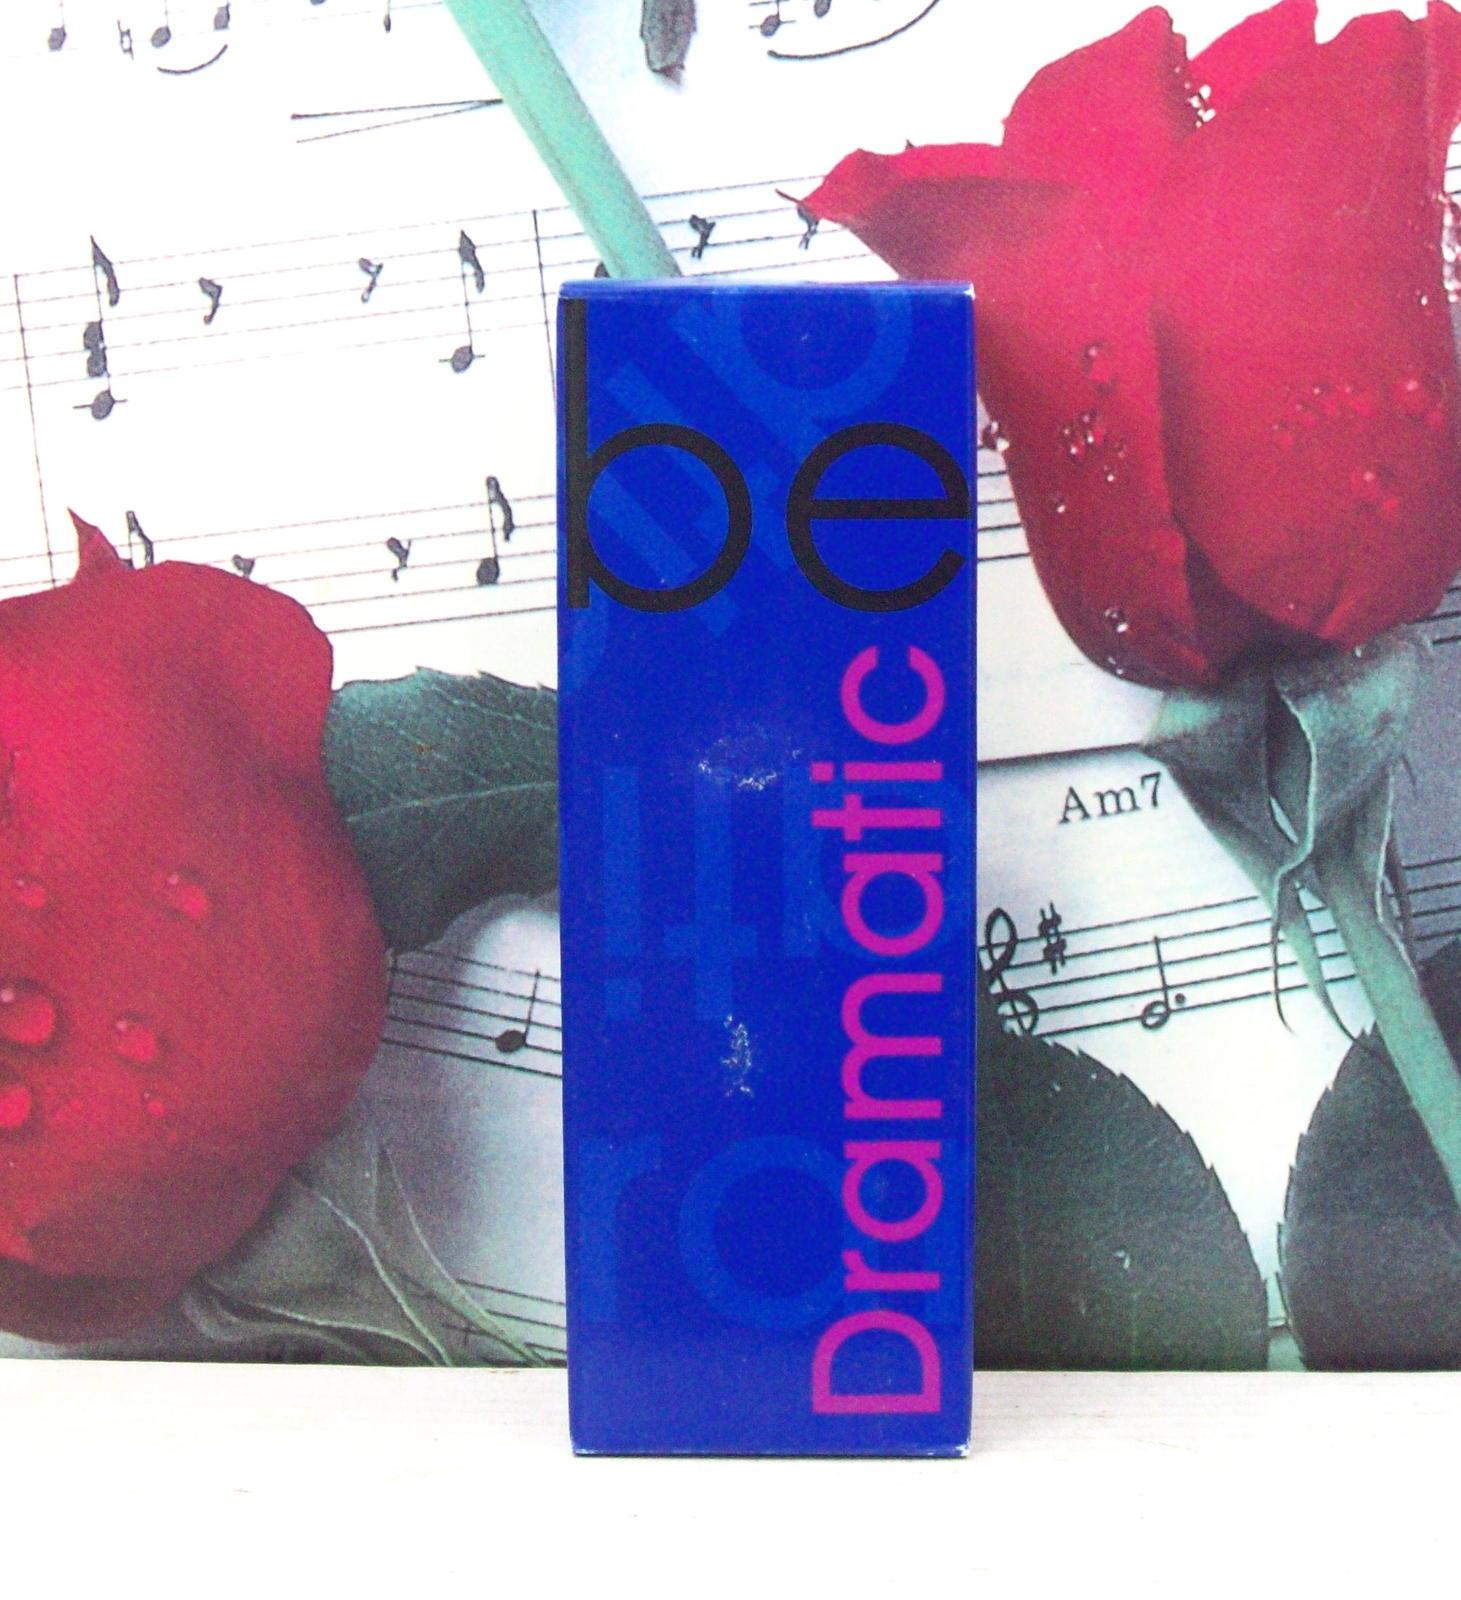 Icing Be Dramatic Cologne Spray 1.0 FL. OZ. NWB - $19.99